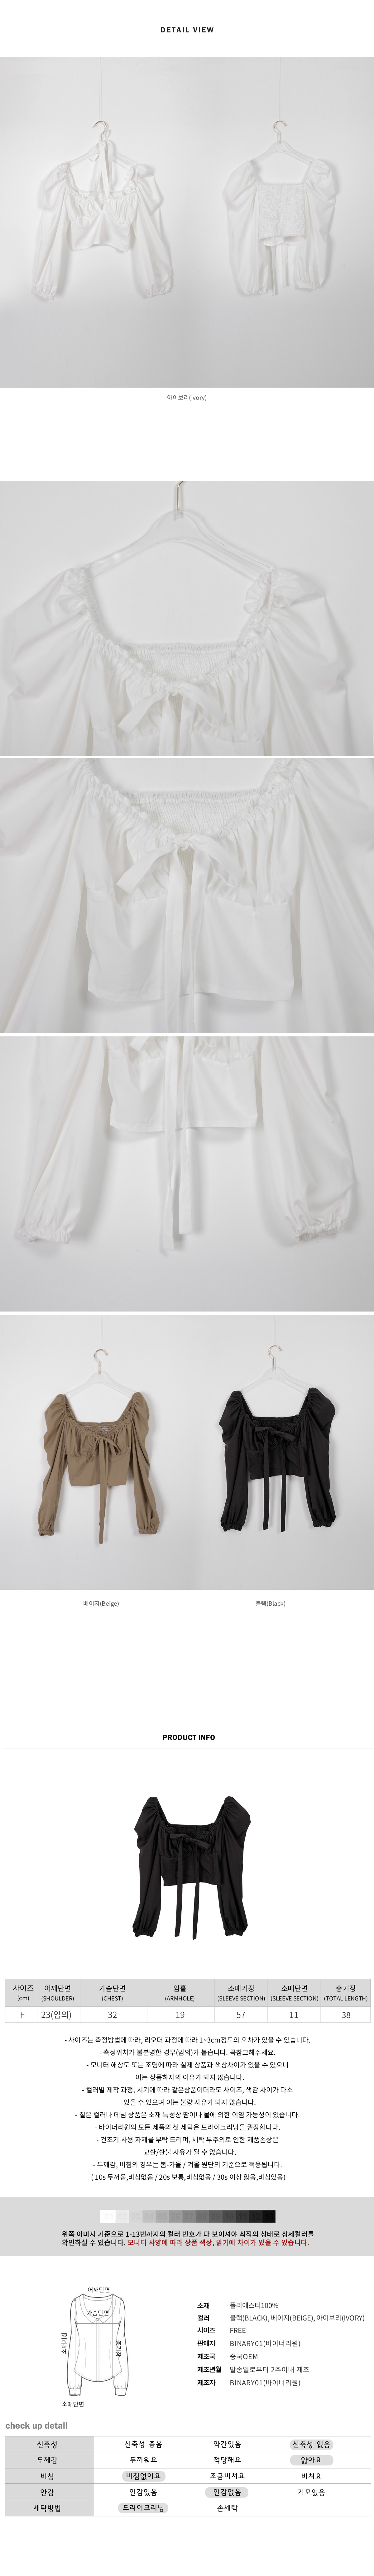 Cropped K blouse